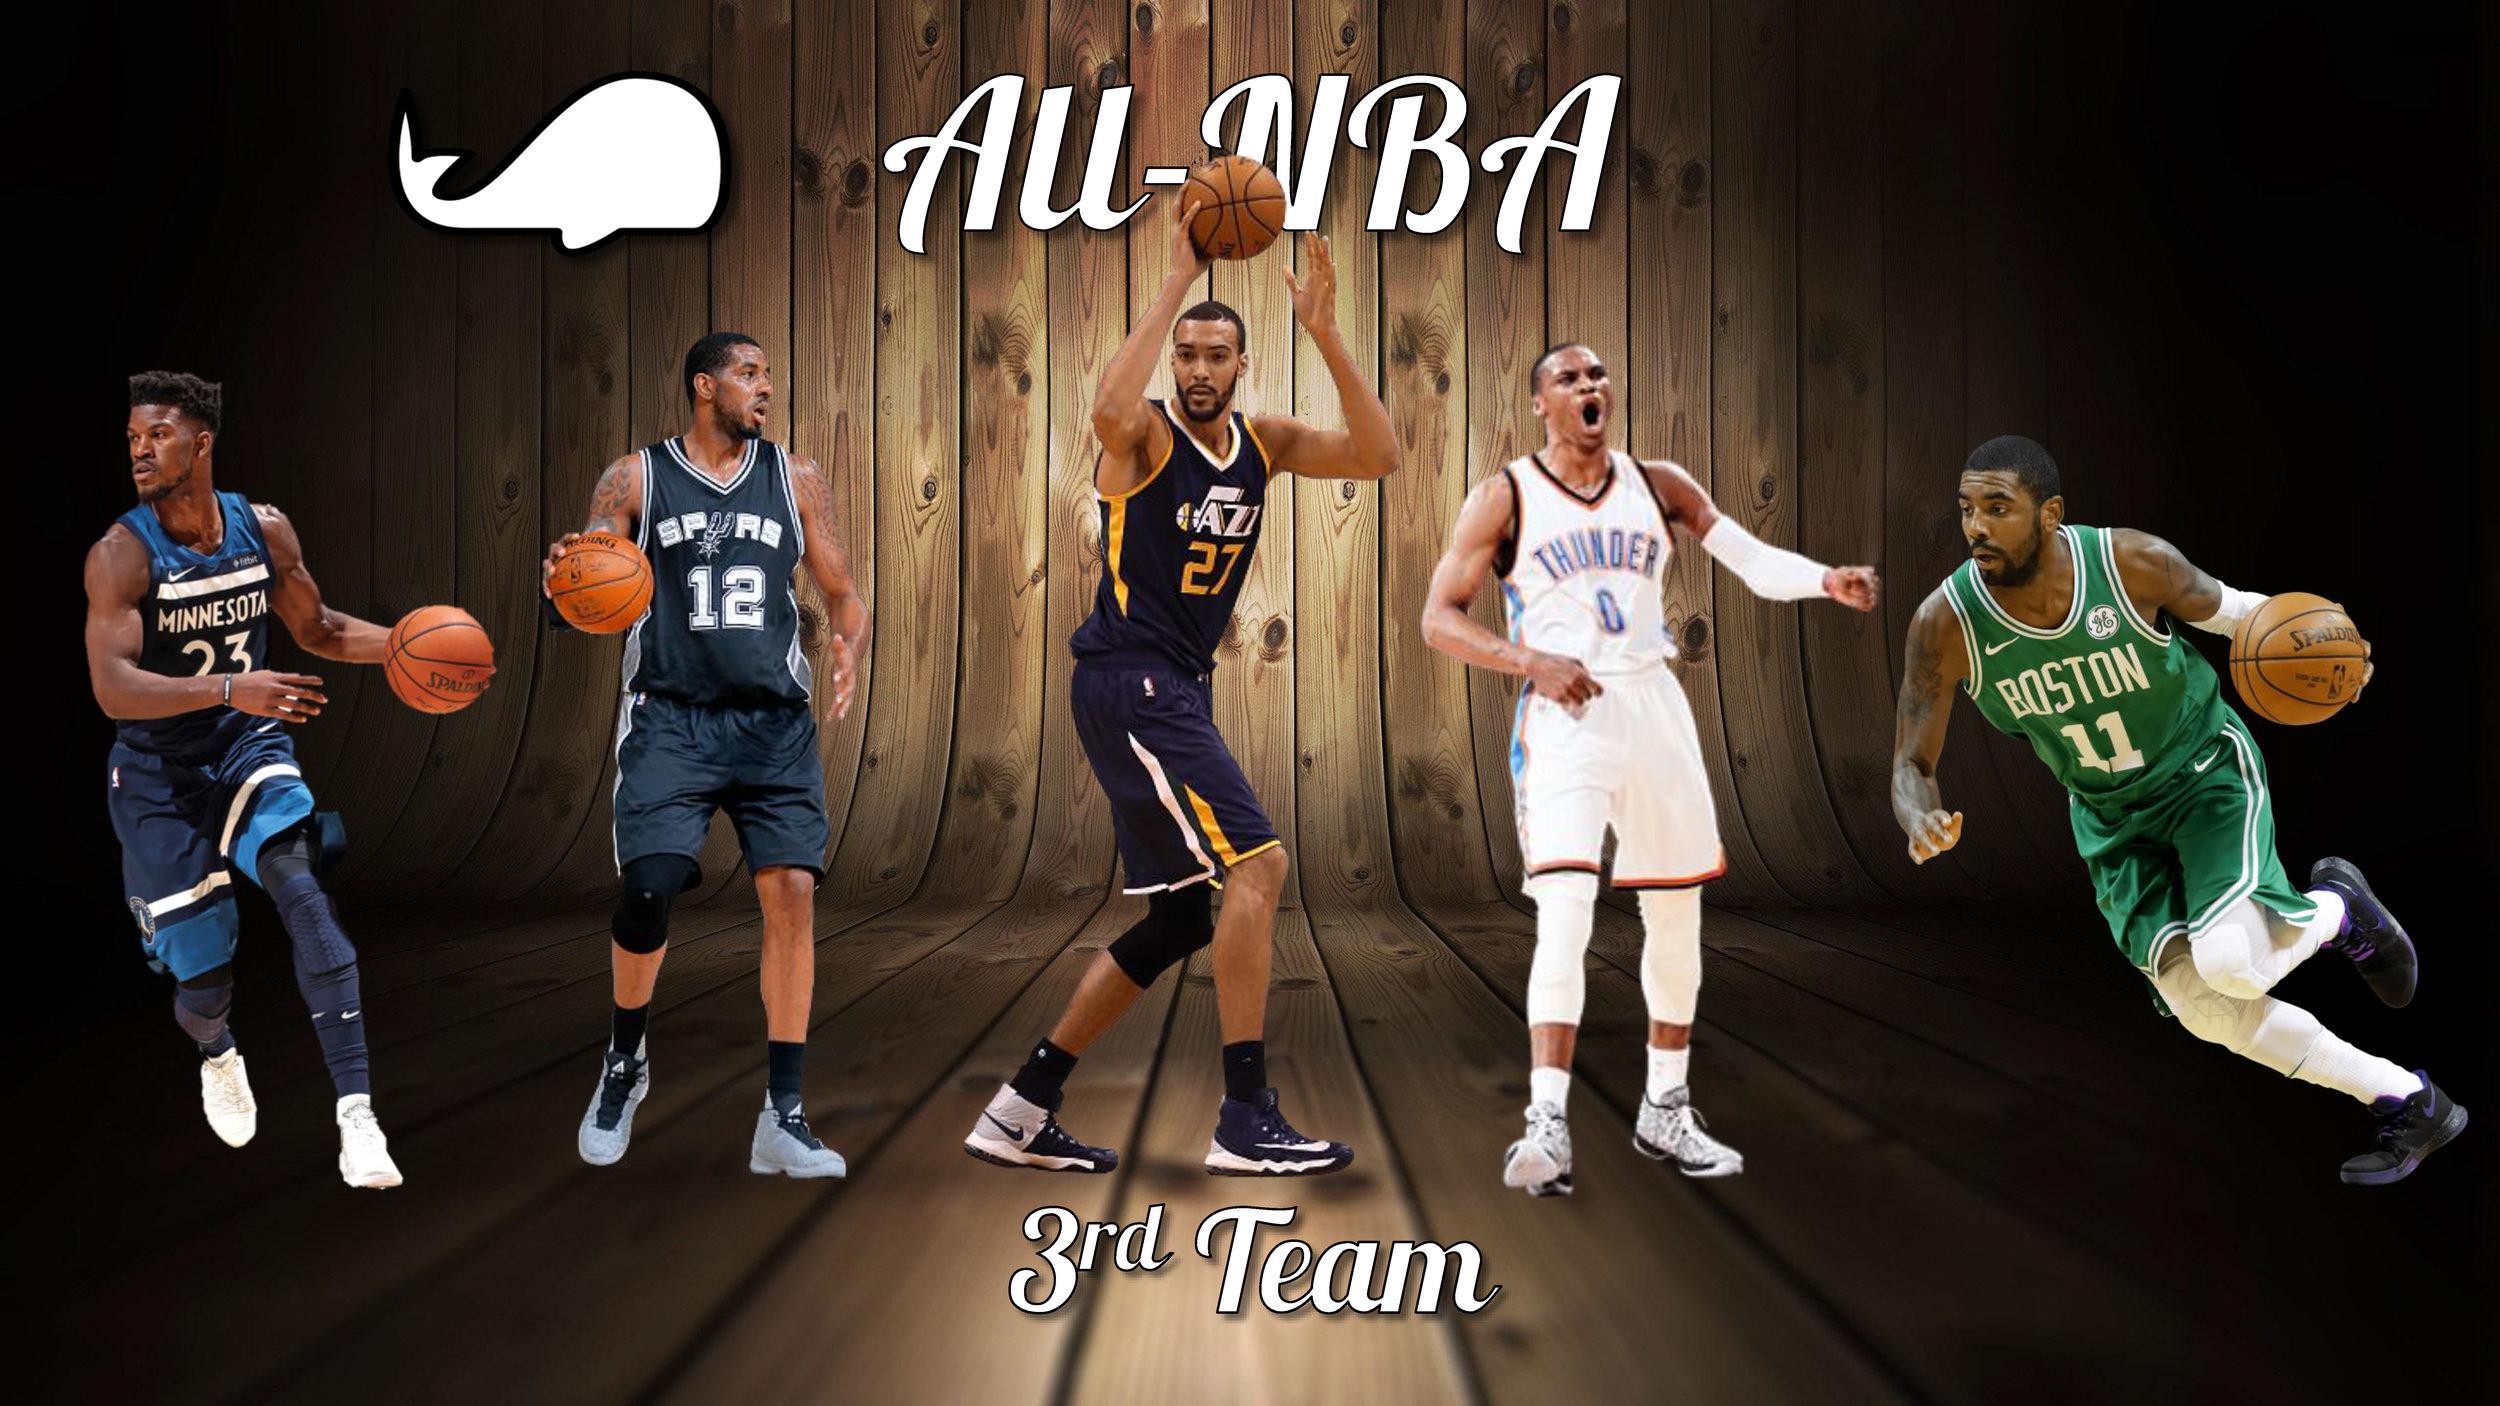 WW_2017_All_NBA_Page_3.jpg